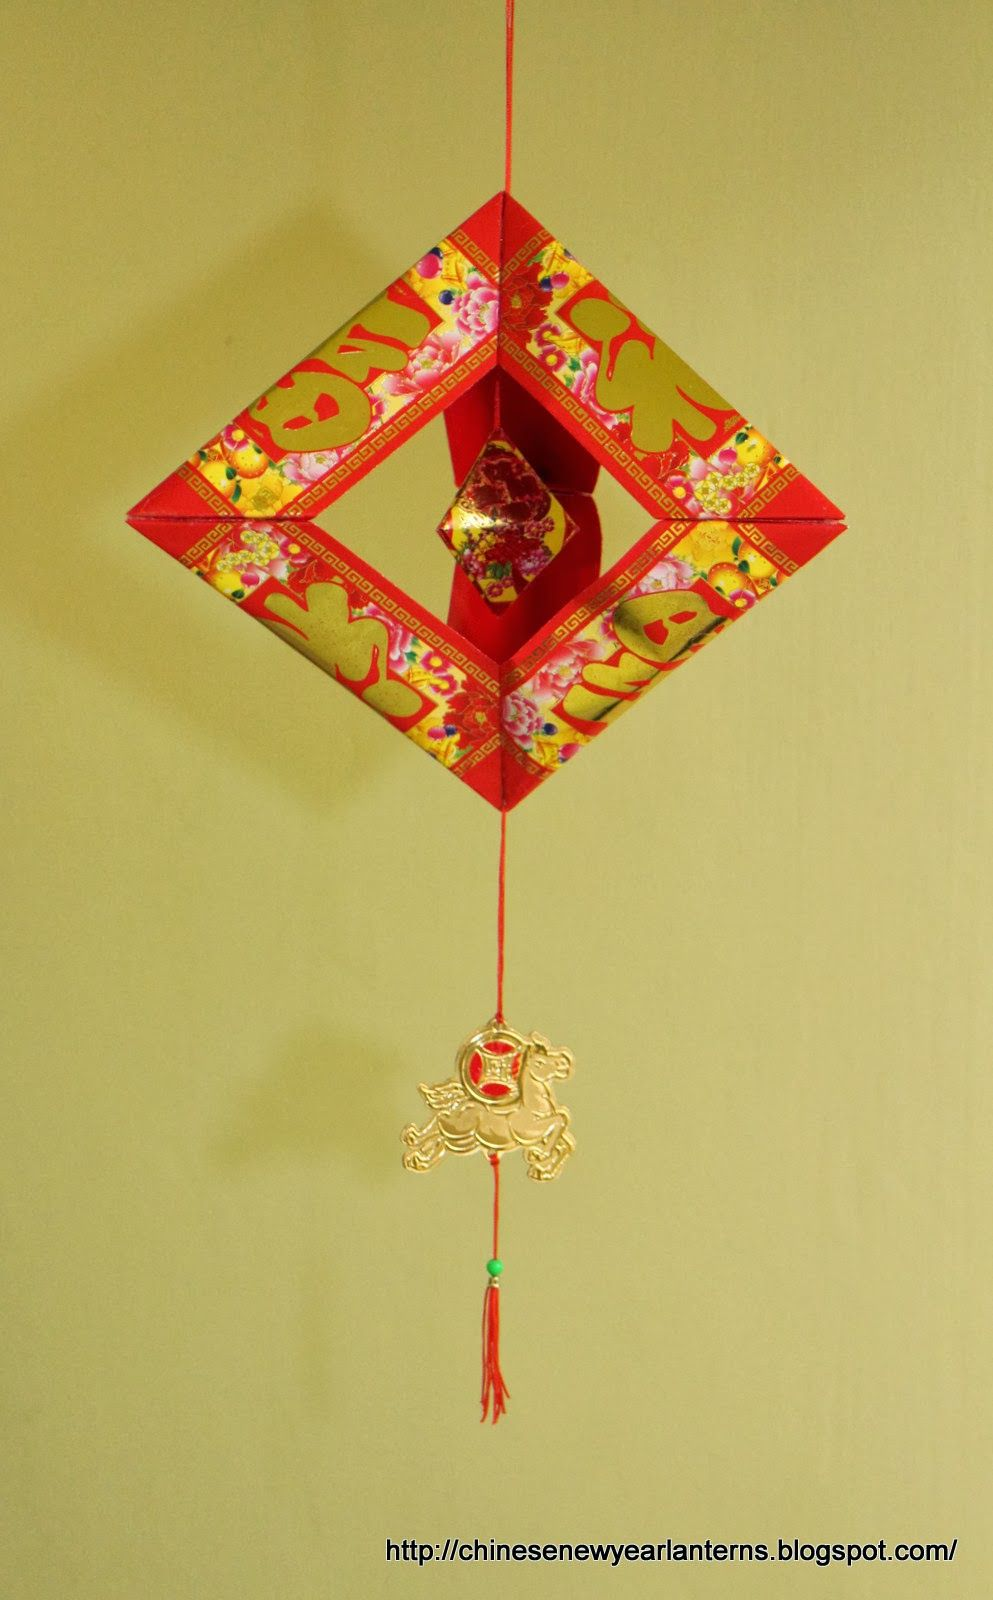 Chinese New Year Lanterns 红包灯笼手工制作: How to make a ...